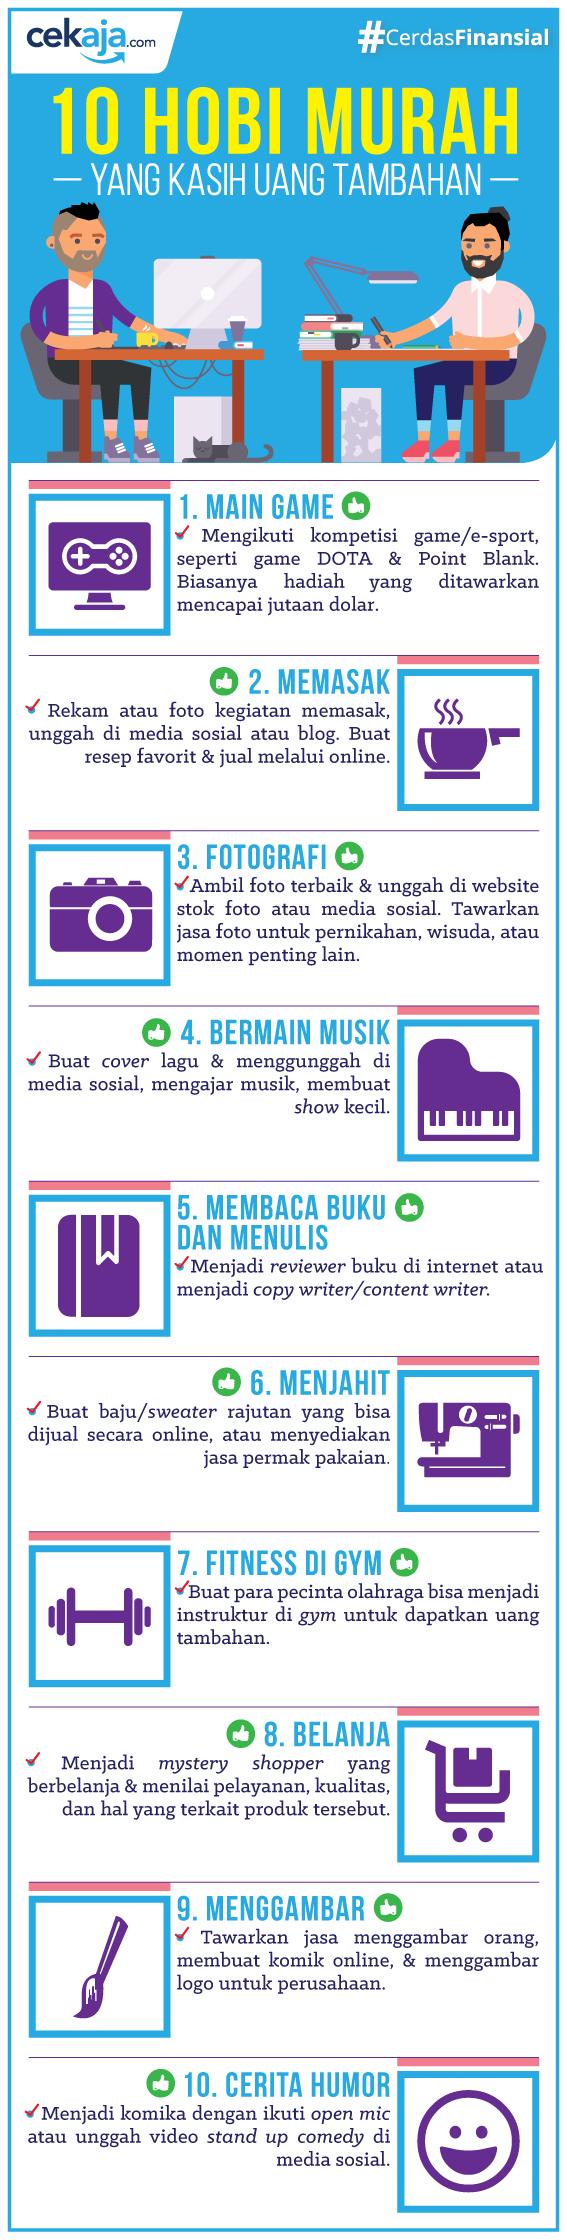 infografis-hobi penghasilan tambahan - CekAja.com